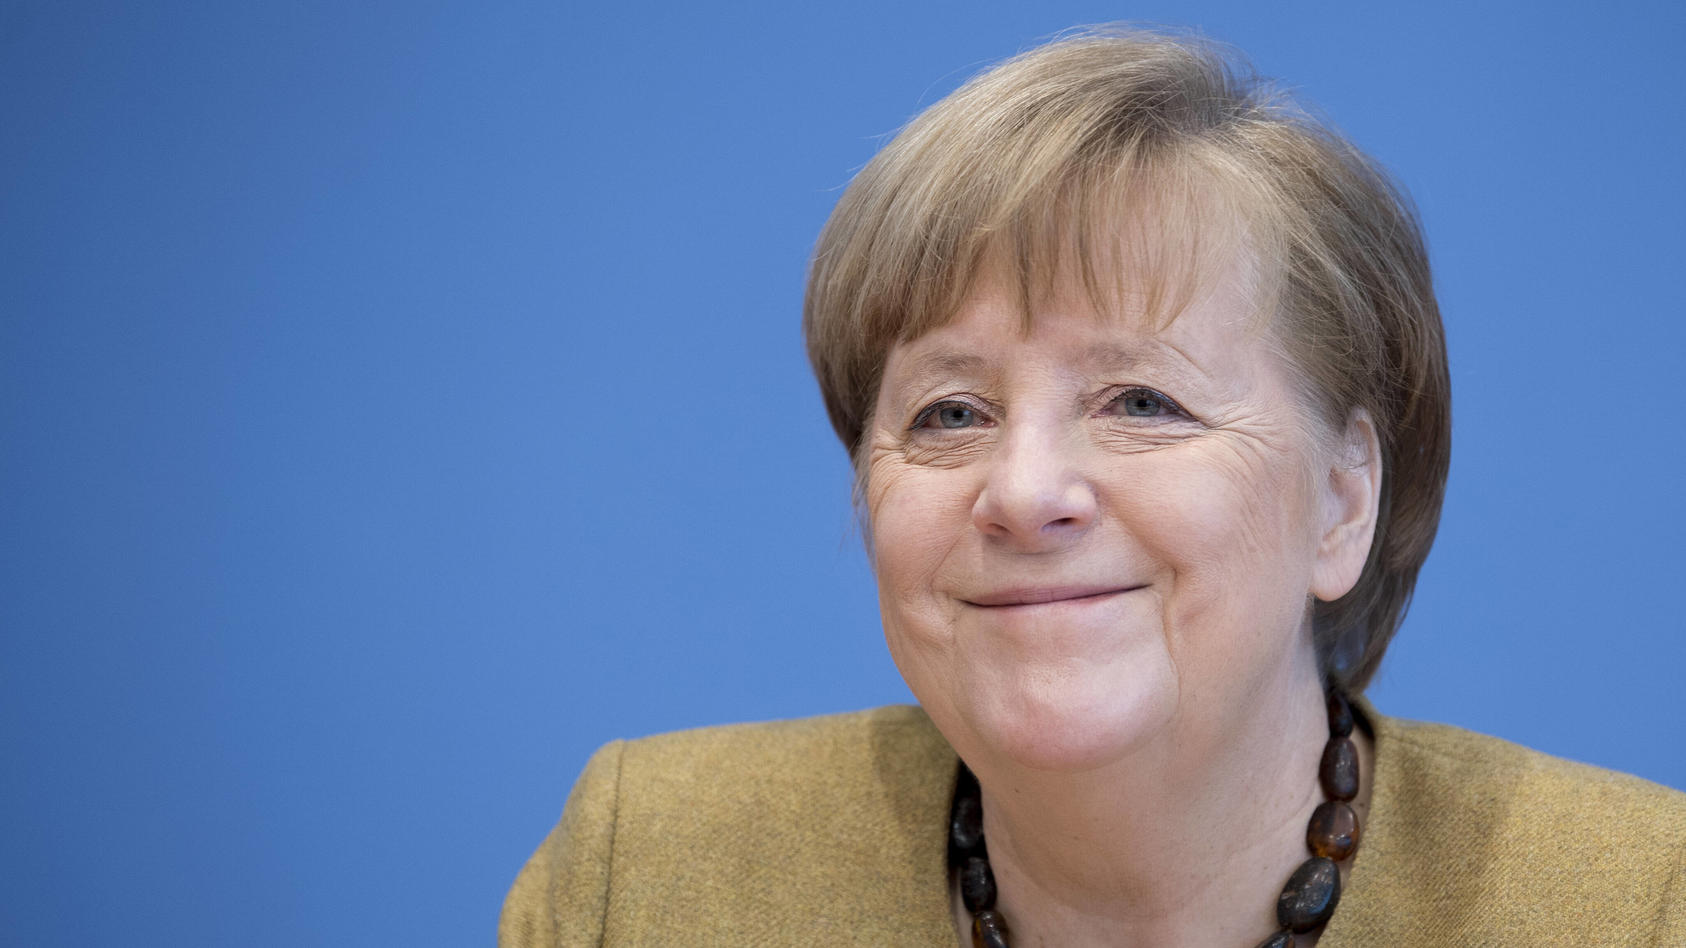 Angela Merkel - Coronavirus DEU, Deutschland, Germany, Berlin, 21.01.2021 Bundeskanzlerin Angela Merkel waehrend der Bu